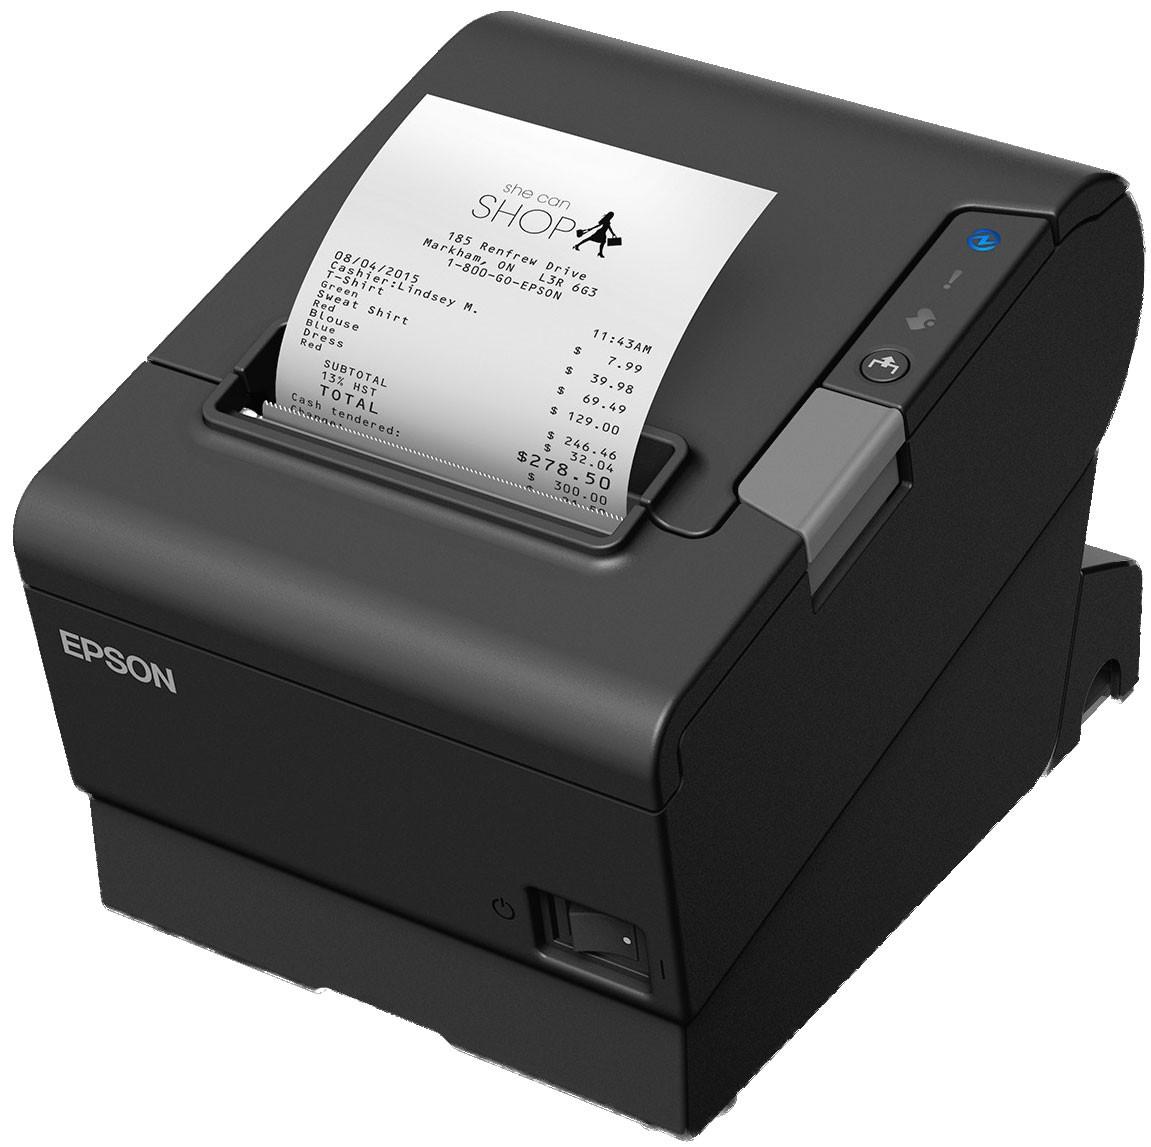 Epson TM-T88VI Parallel Printer; black (TM886PNG)